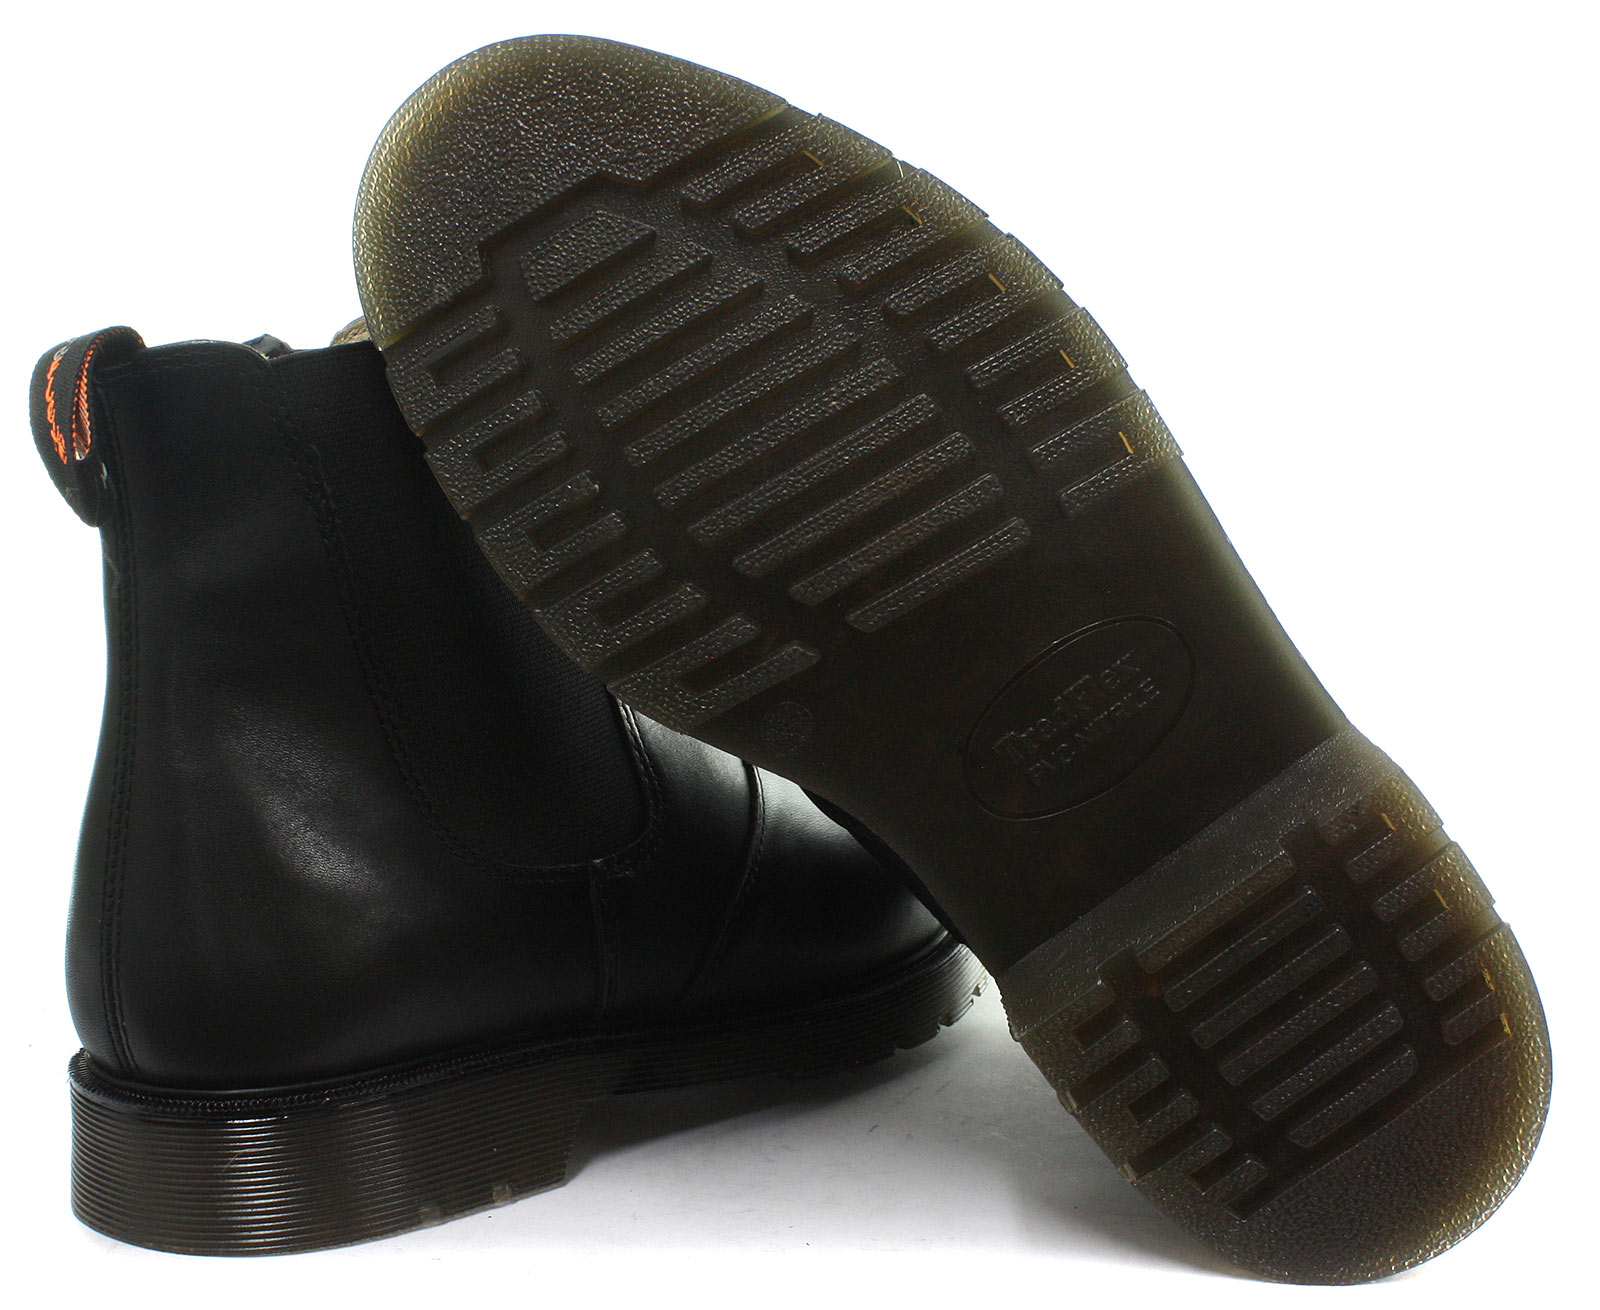 Neu Neu Neu Trotflex Twin Gusset Unisex Chelsea Stiefel Alle Größen 9a951e